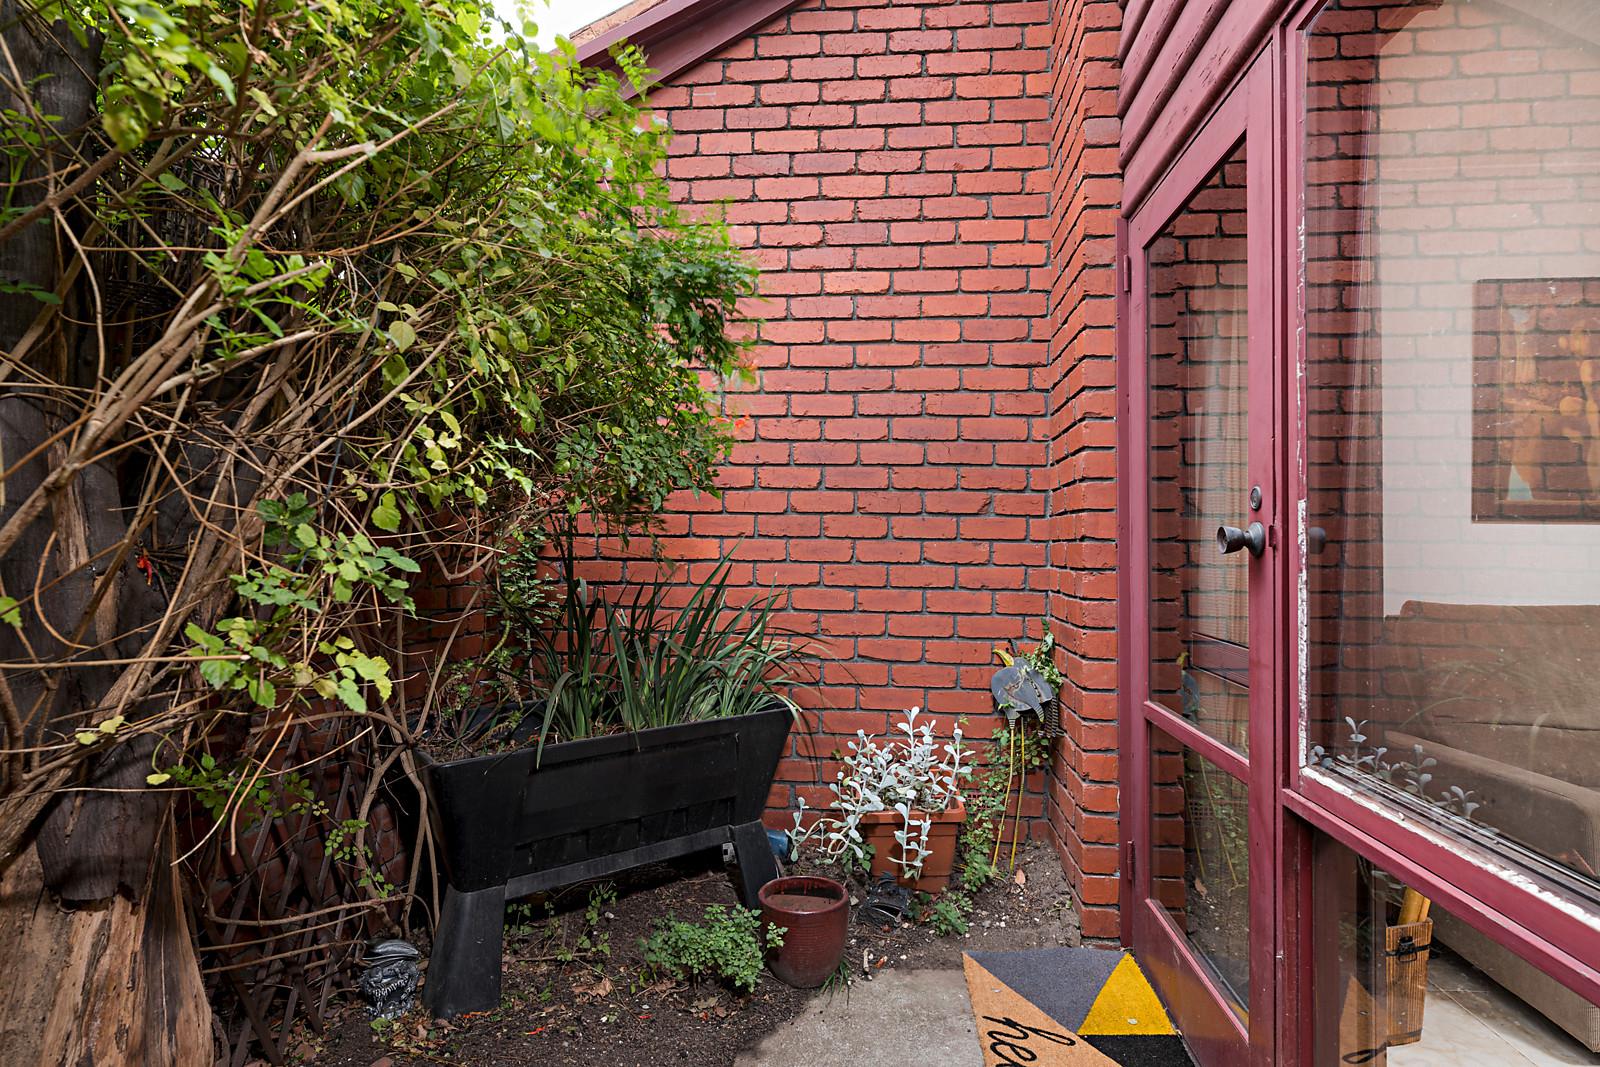 2/184 Edwardes Street, Reservoir, VIC, 3073 image 7